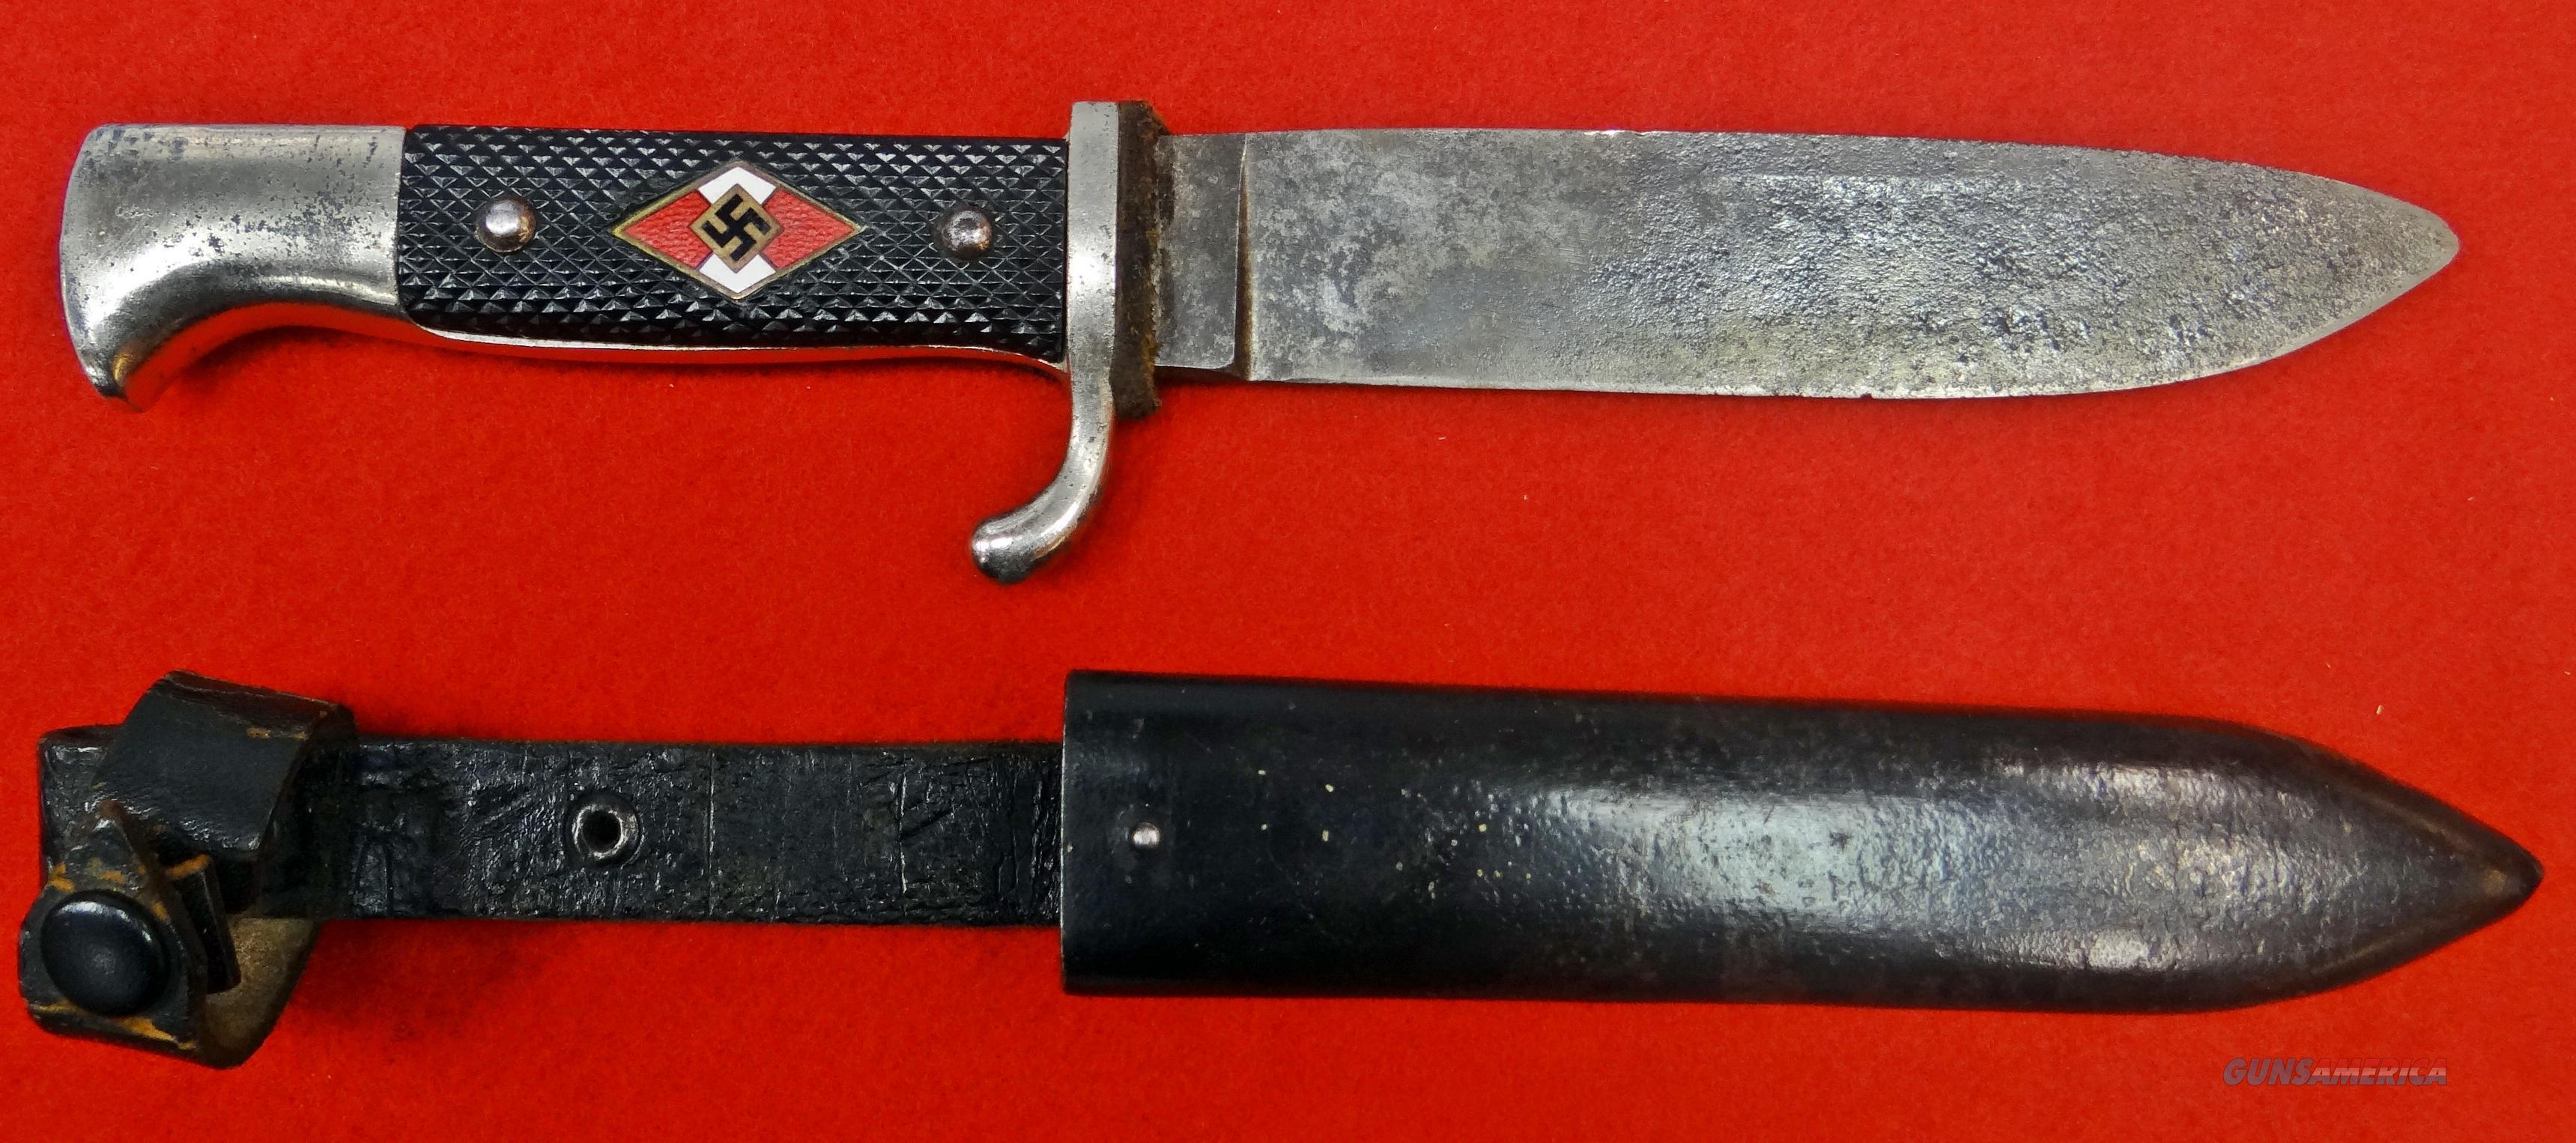 Hitler Youth Knife For Sale